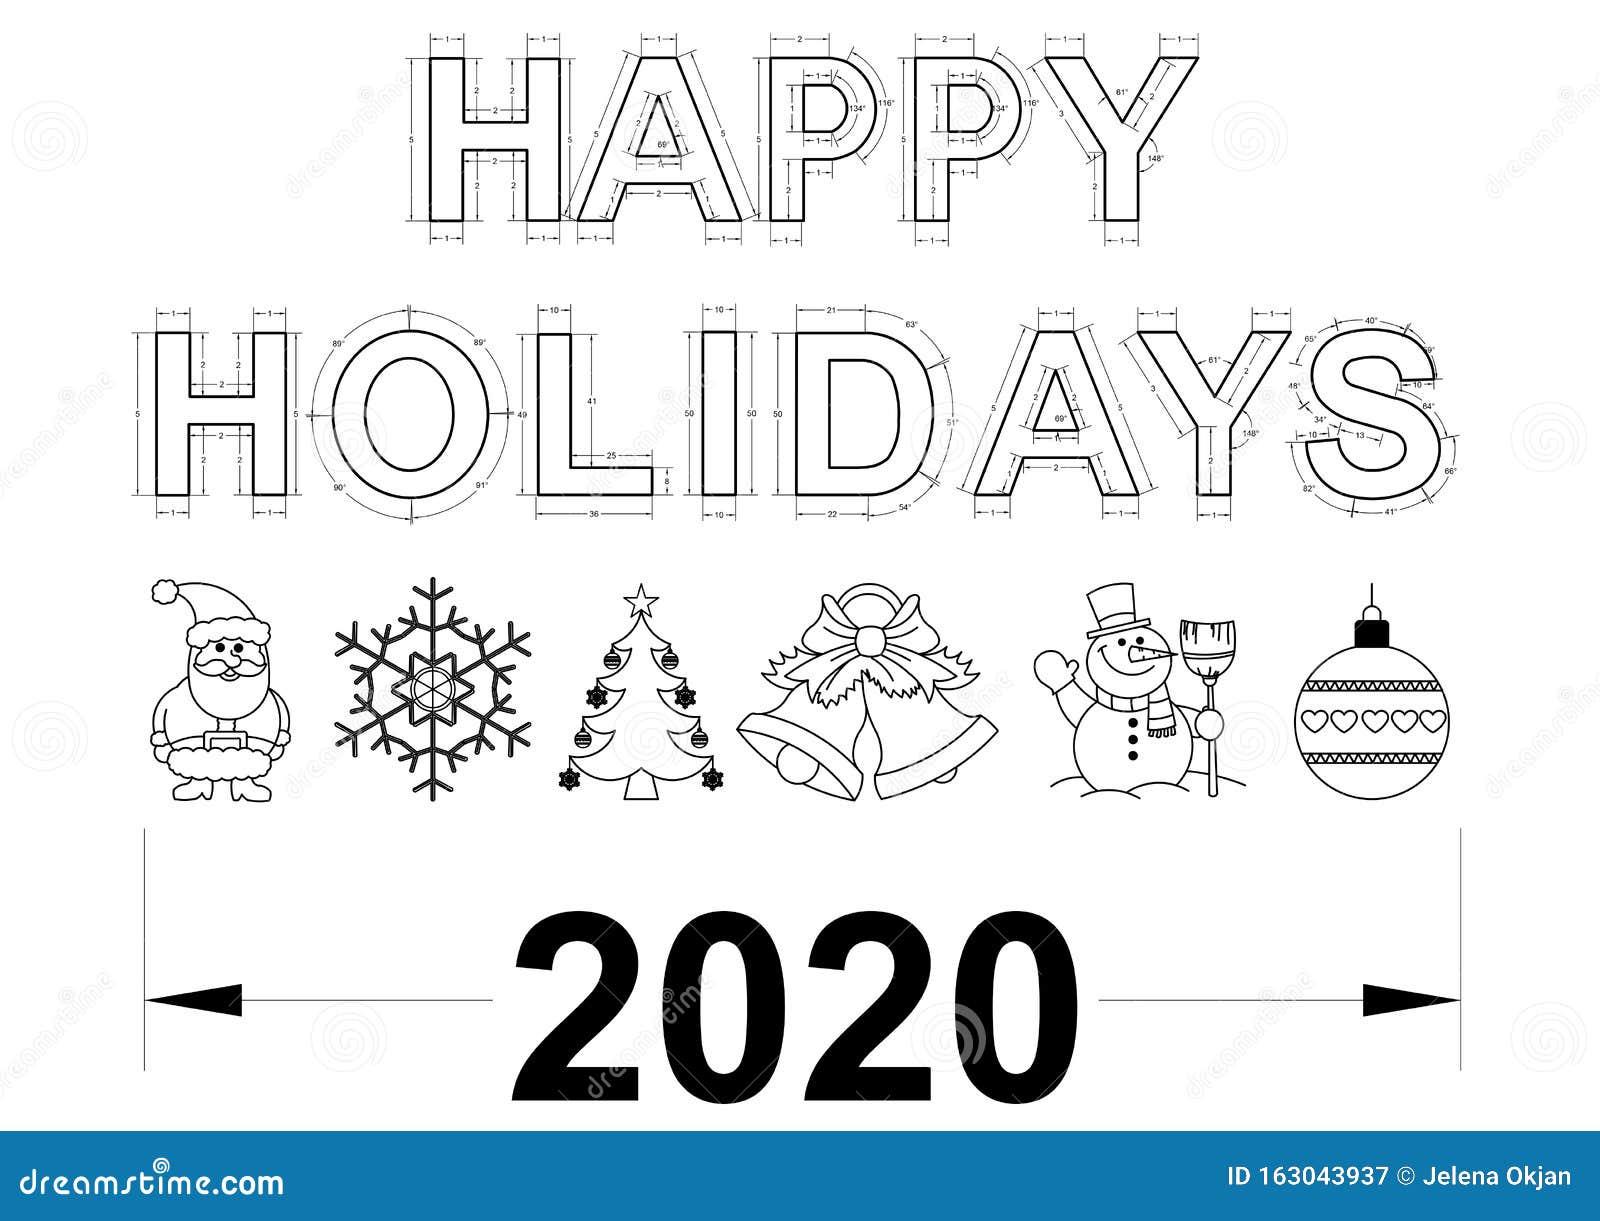 Happy Holidays 2020 Blueprint